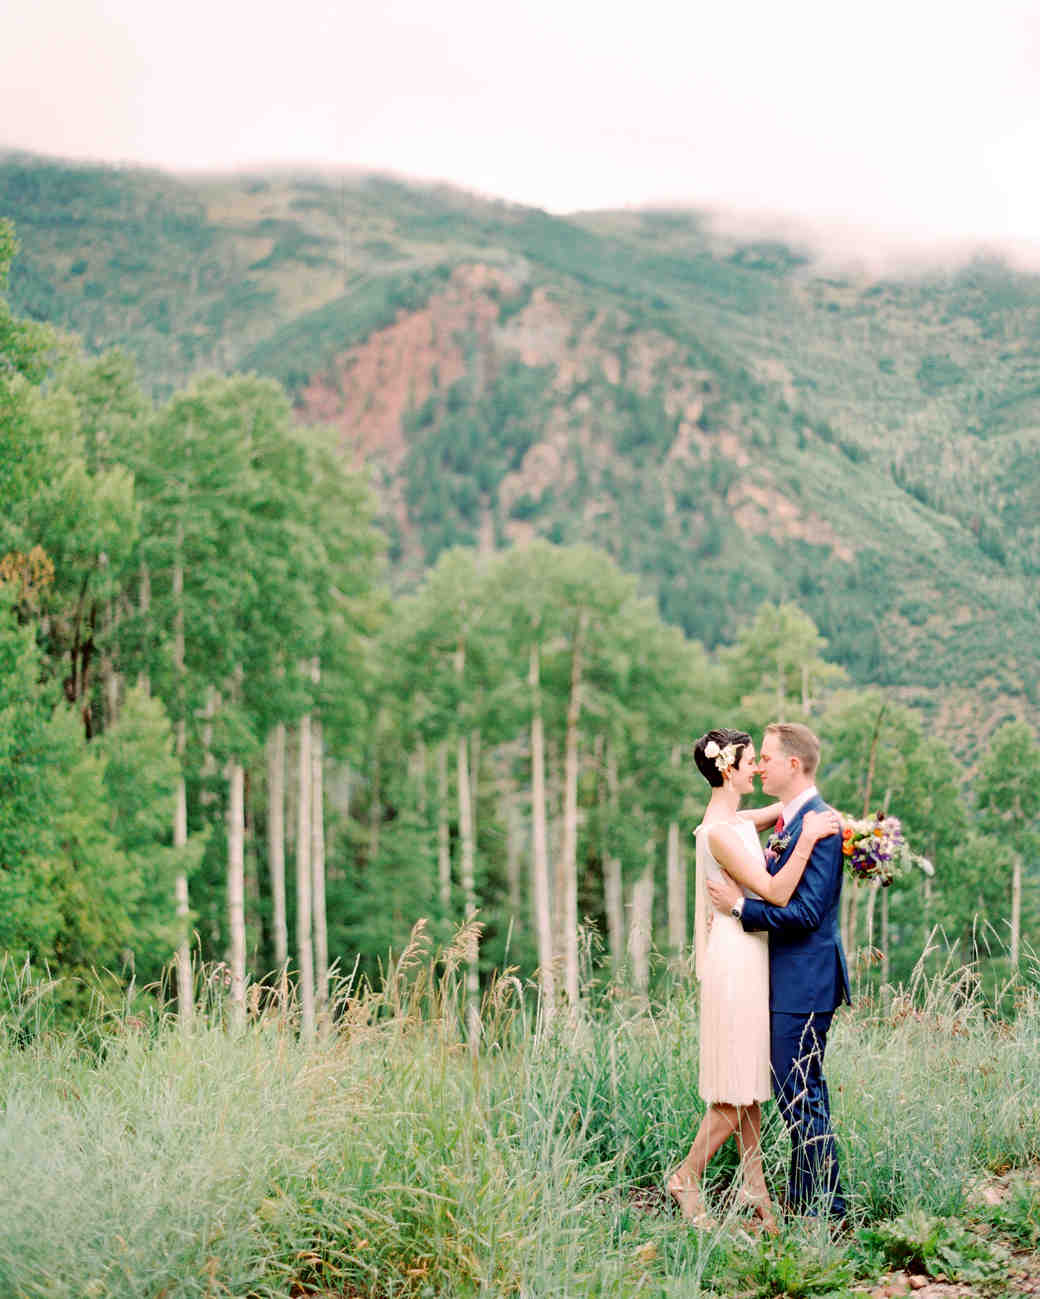 Photography Sara Htedt